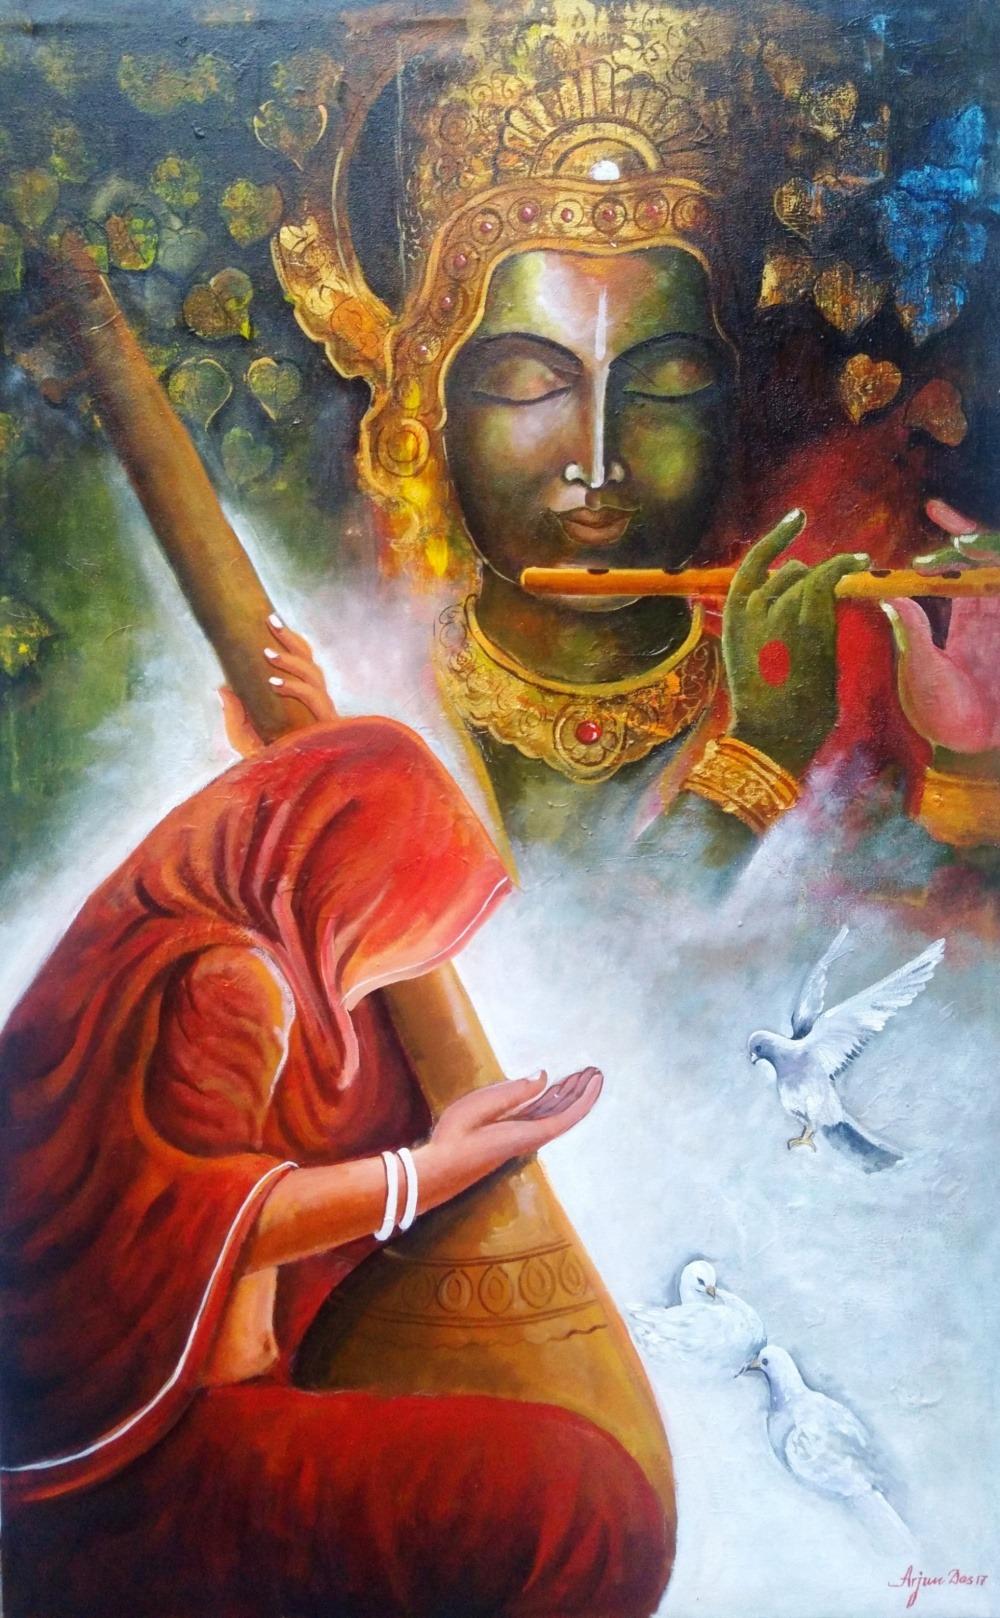 Meera Ke Krishna By Artist Arjun Das